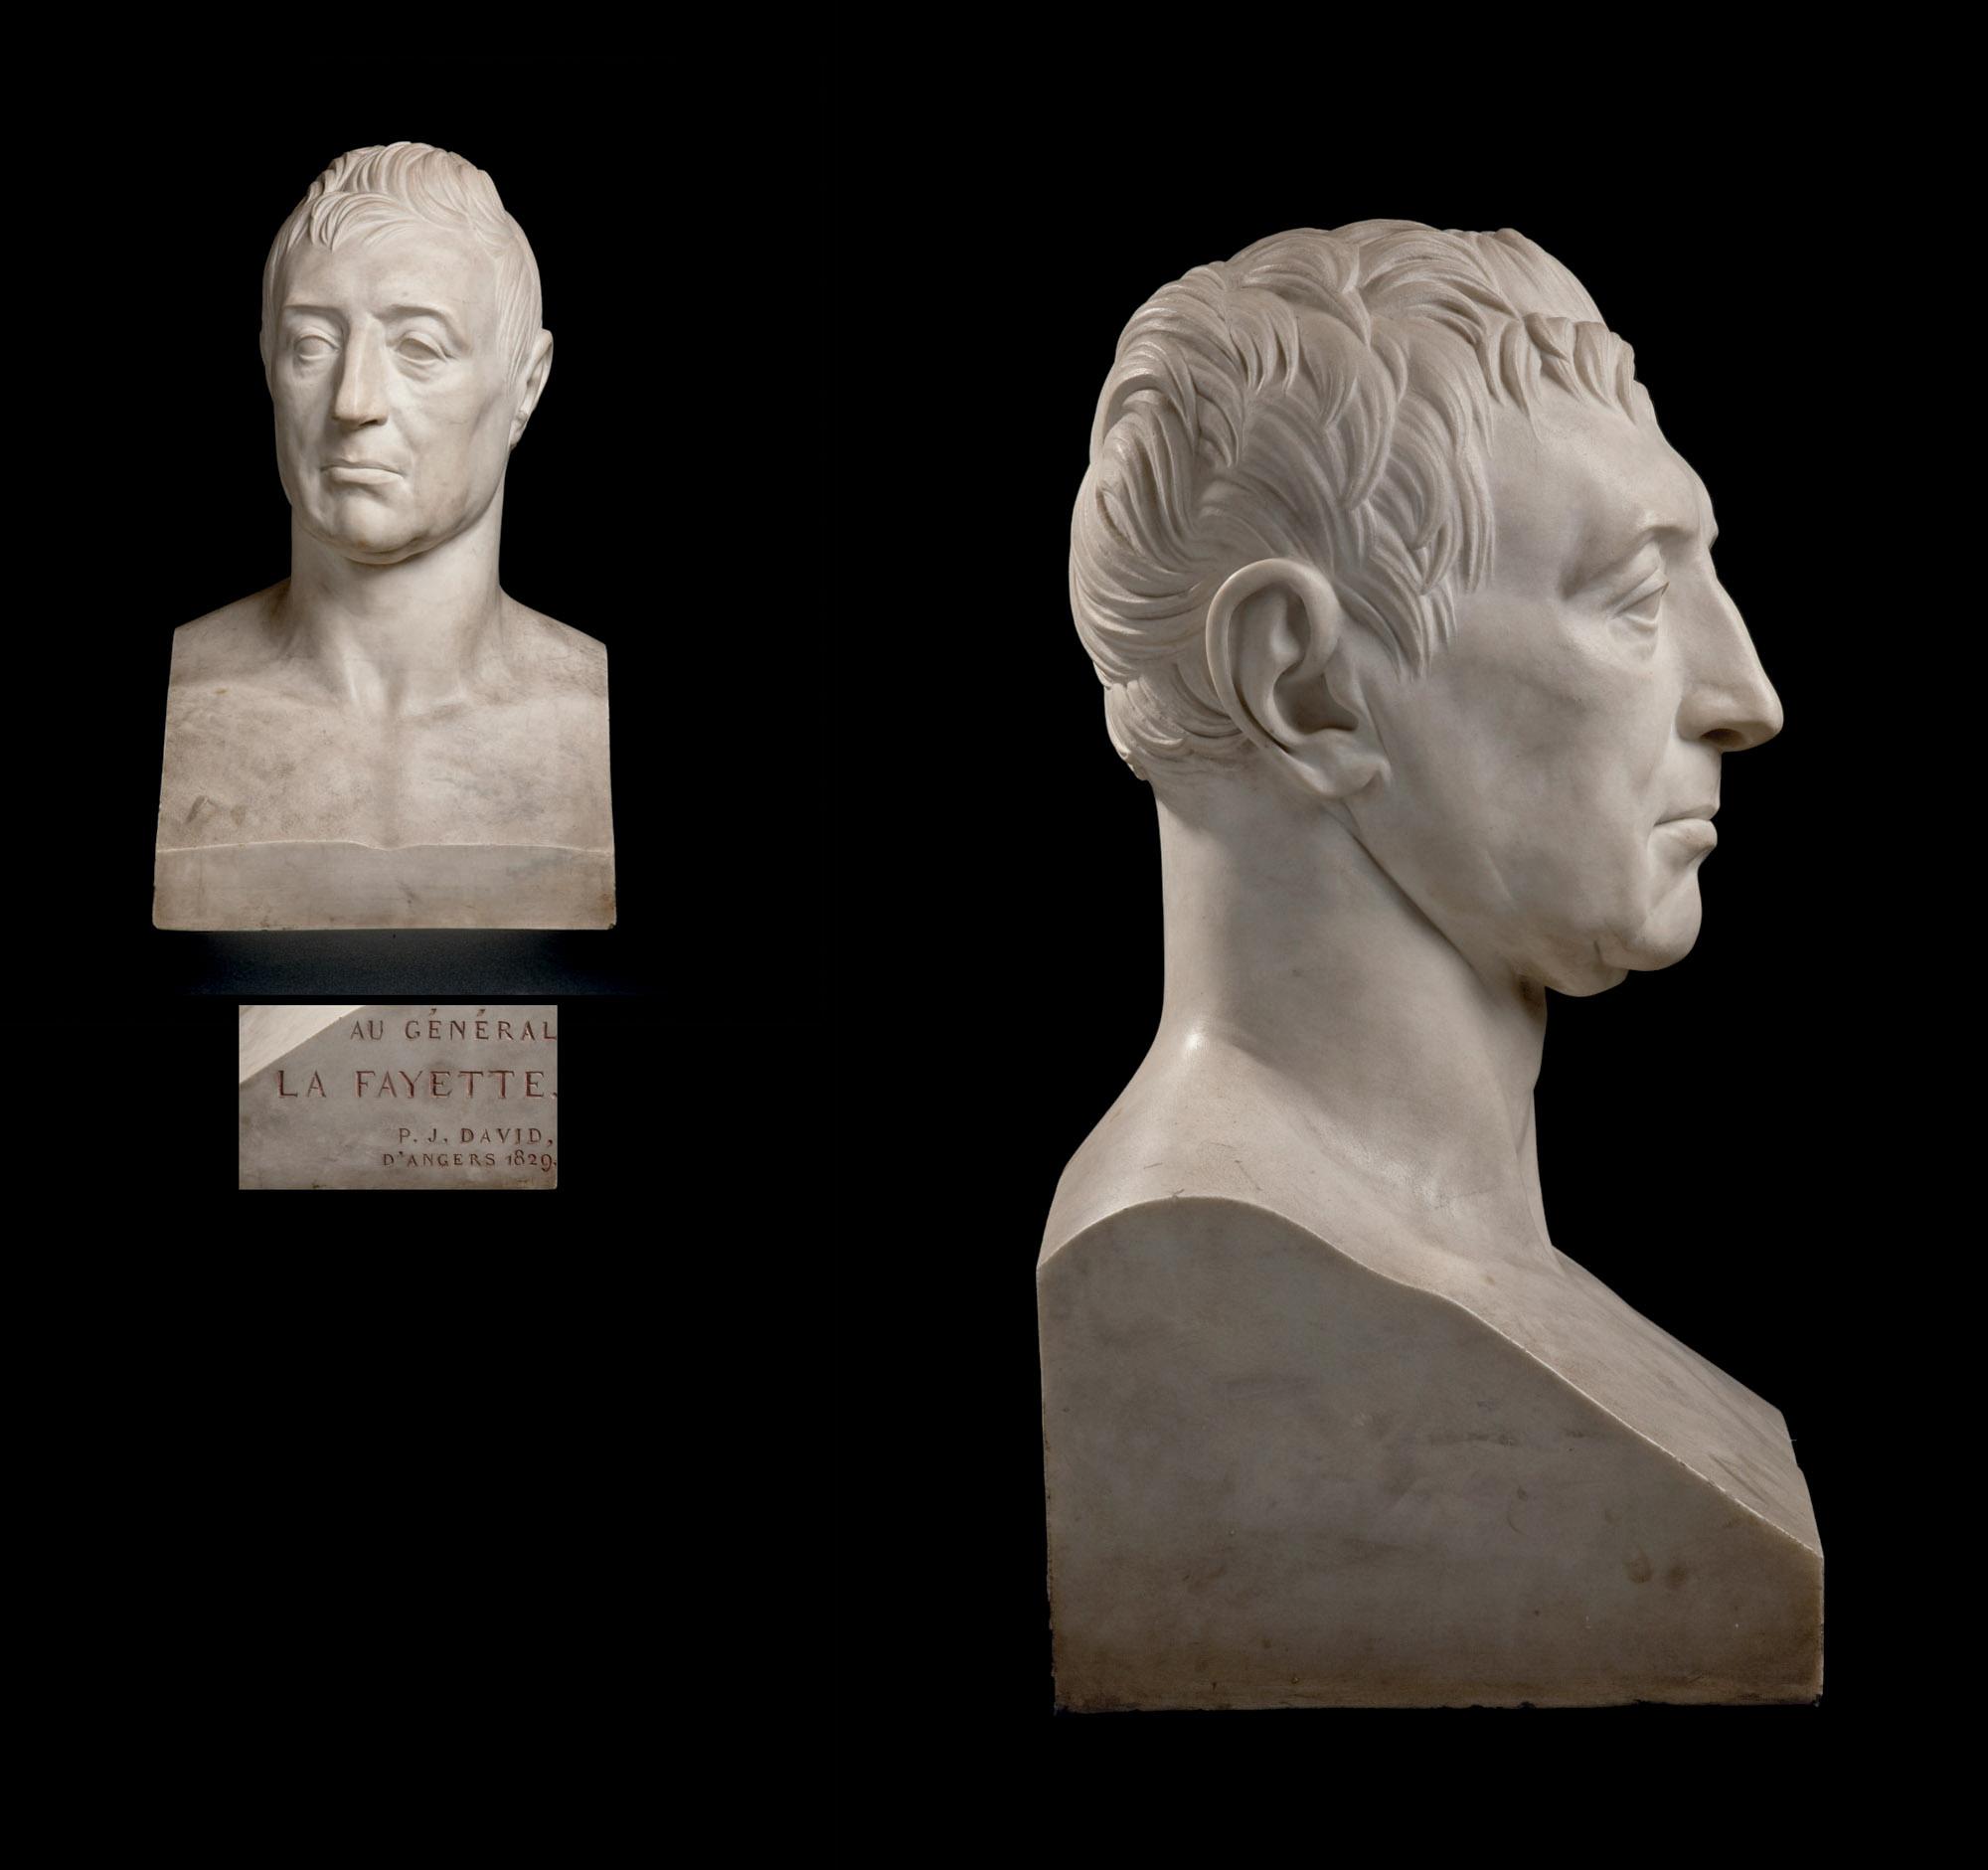 JEAN-DAVID D'ANGERS (1788-1856)